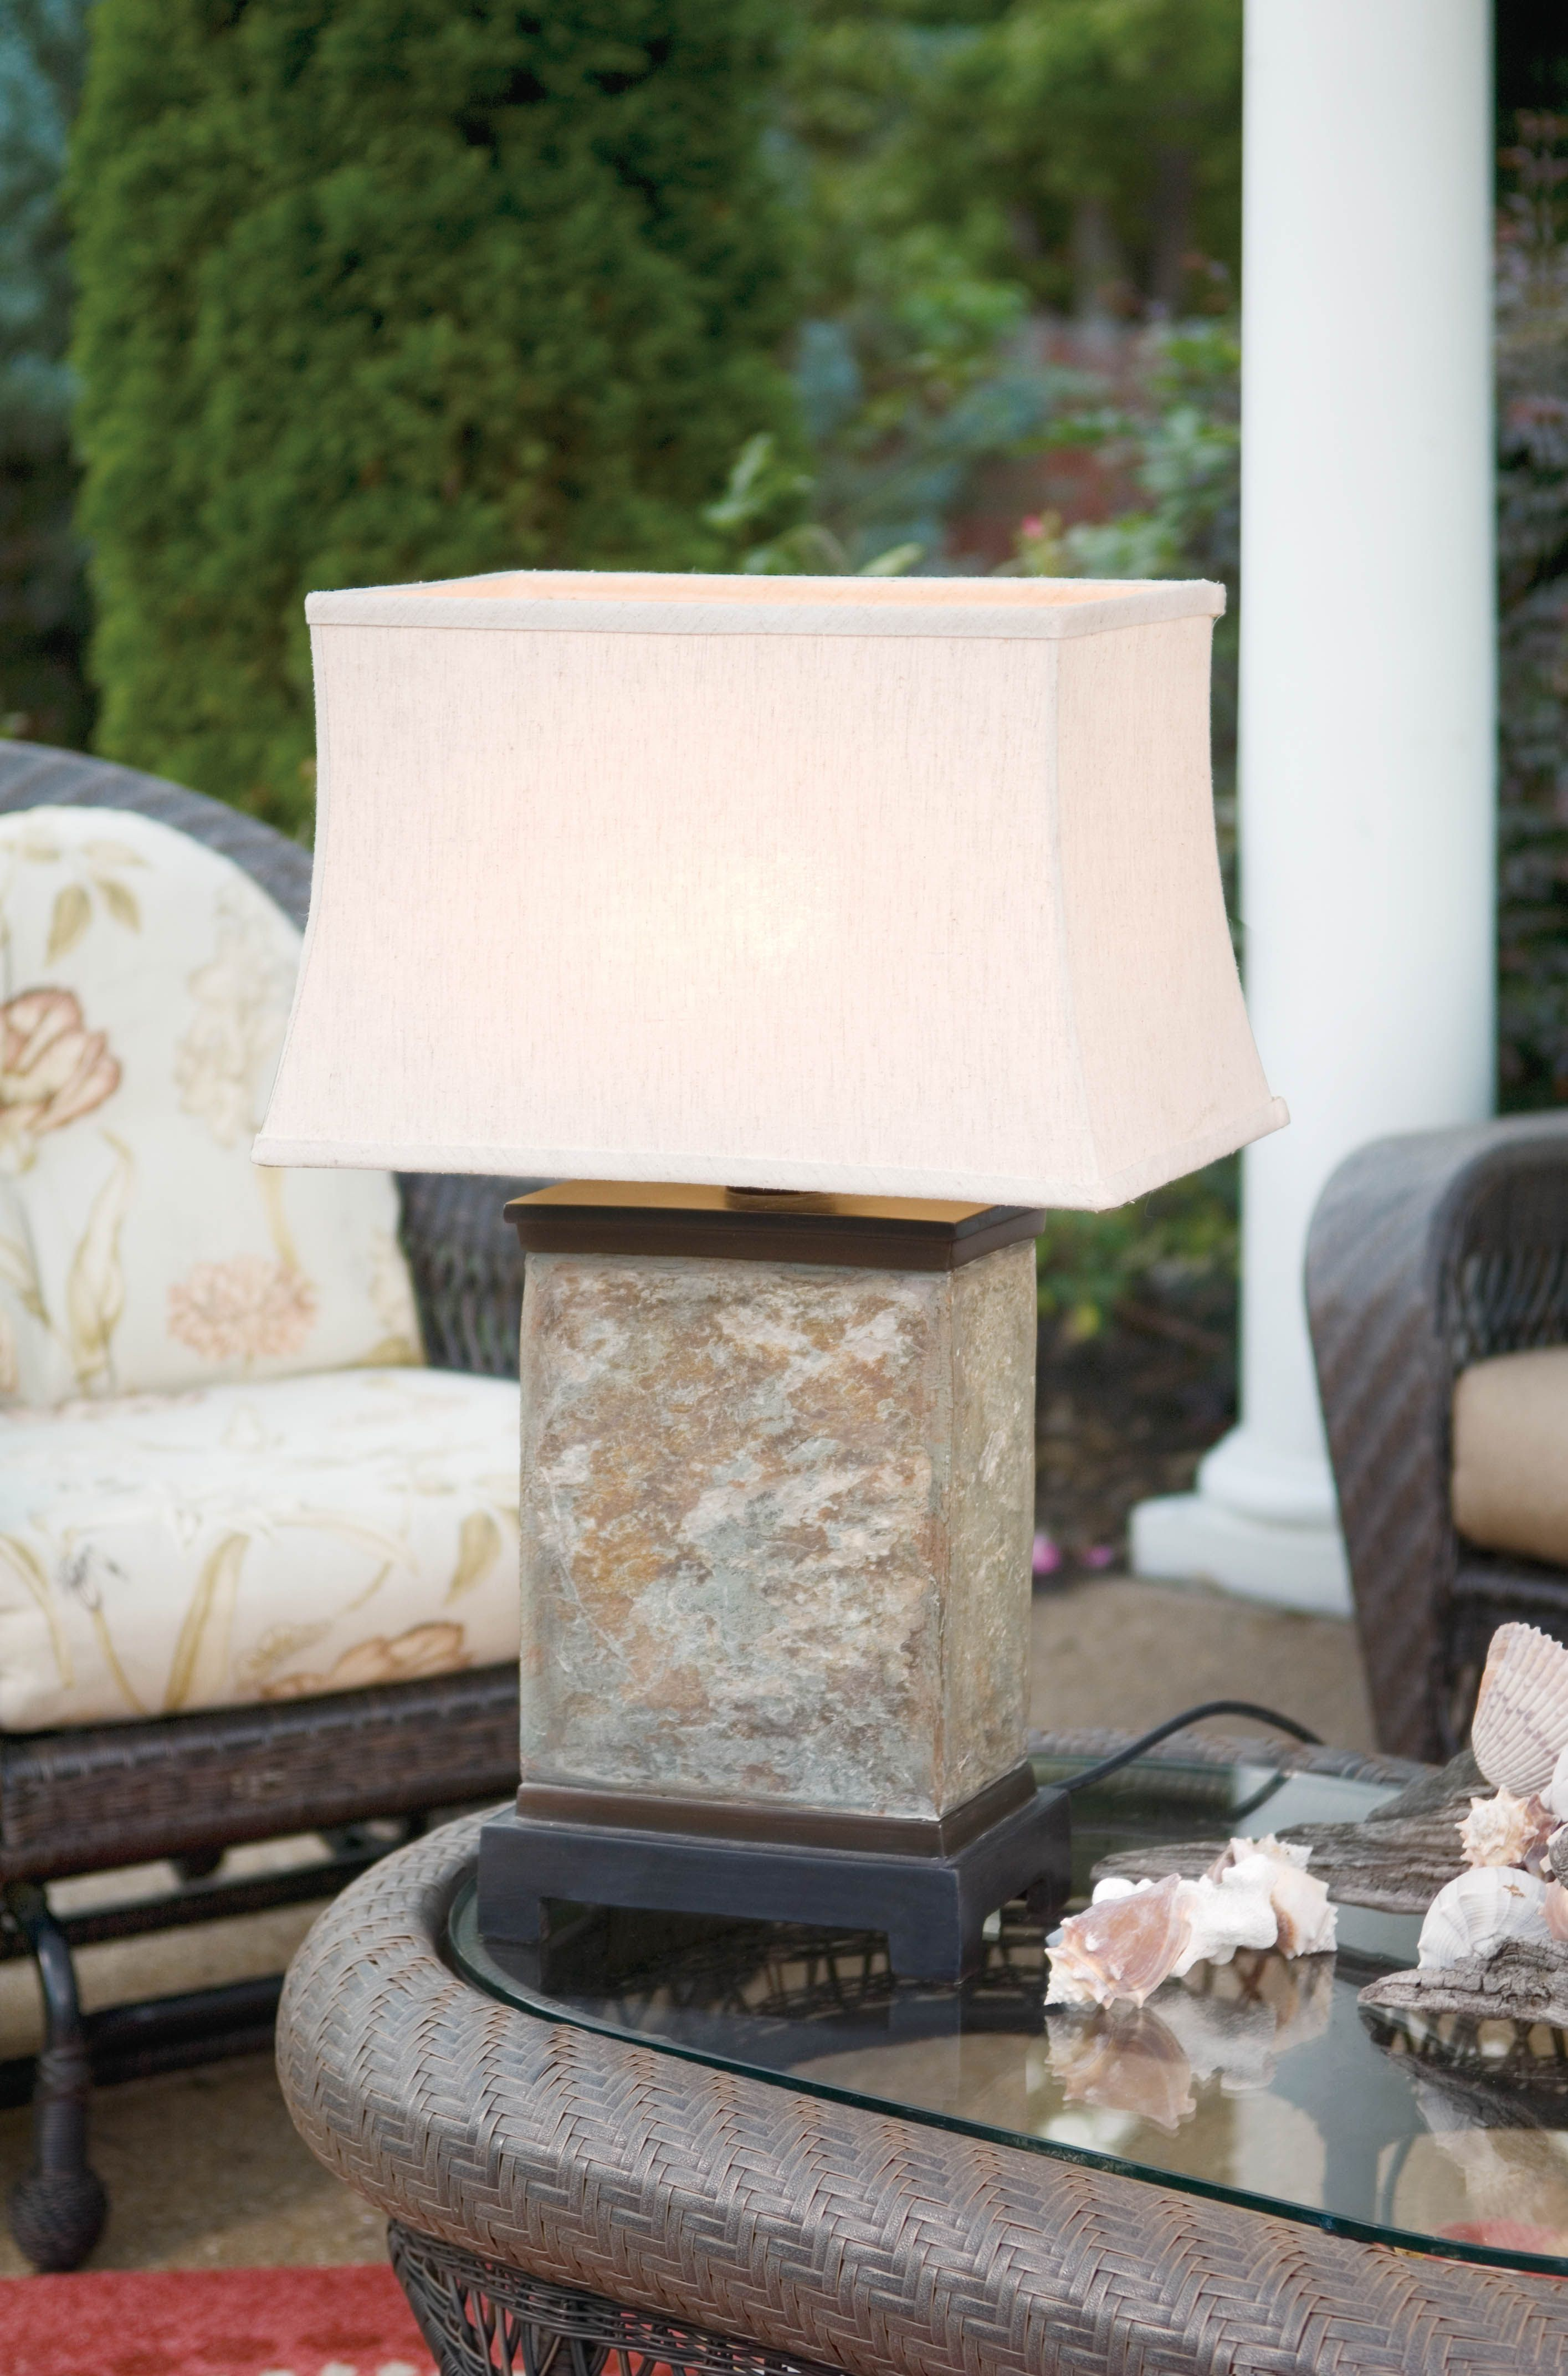 Slate Slab Outdoor Table Lamp Patio Decor Ideas Outdoor